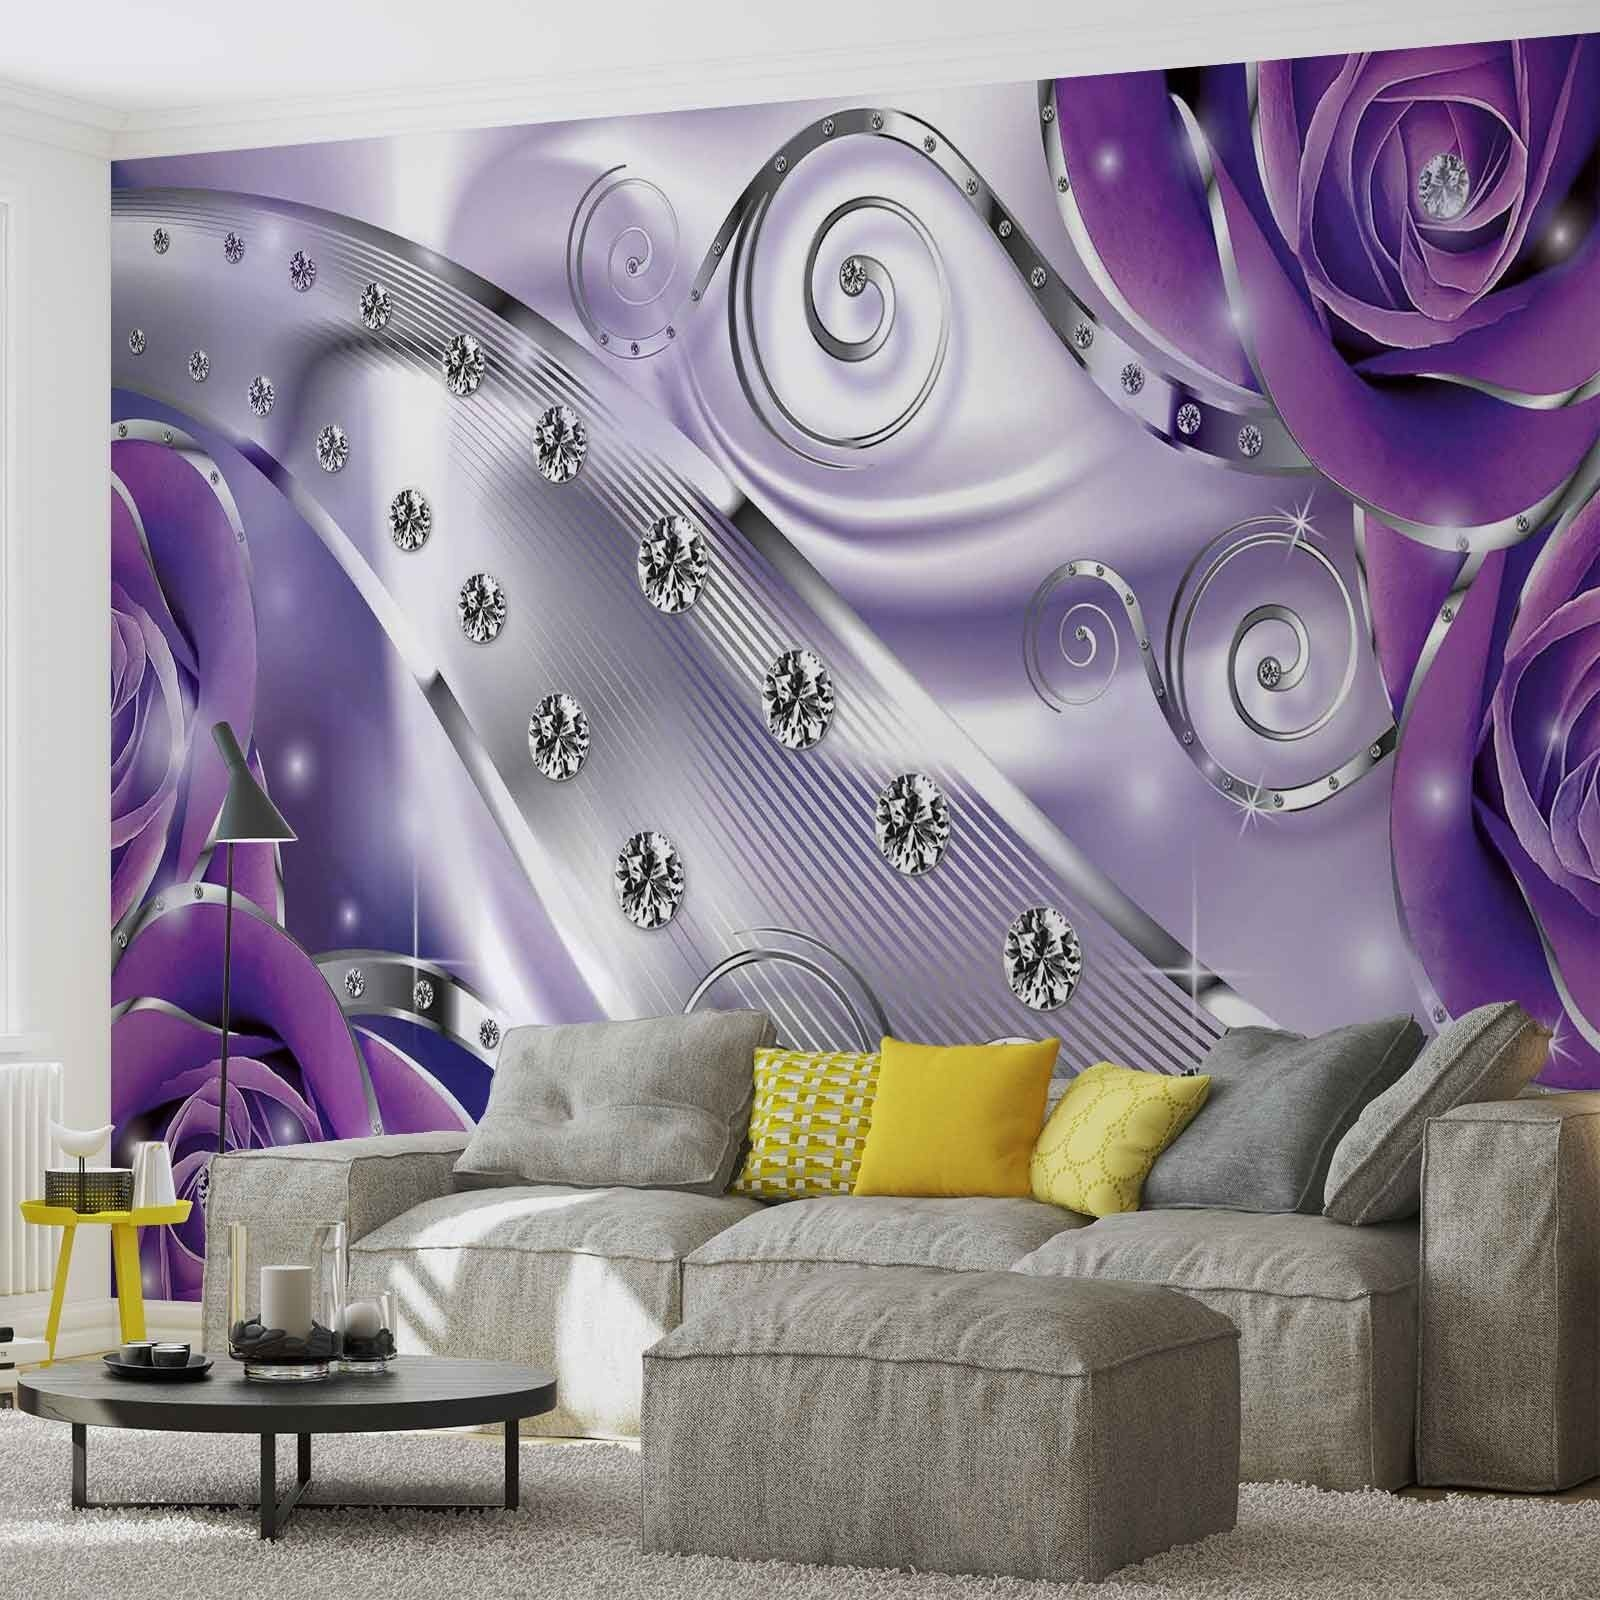 Tapete Fototapete lila Floral Diamond Abstract Modern Photo Wallpaper Mural